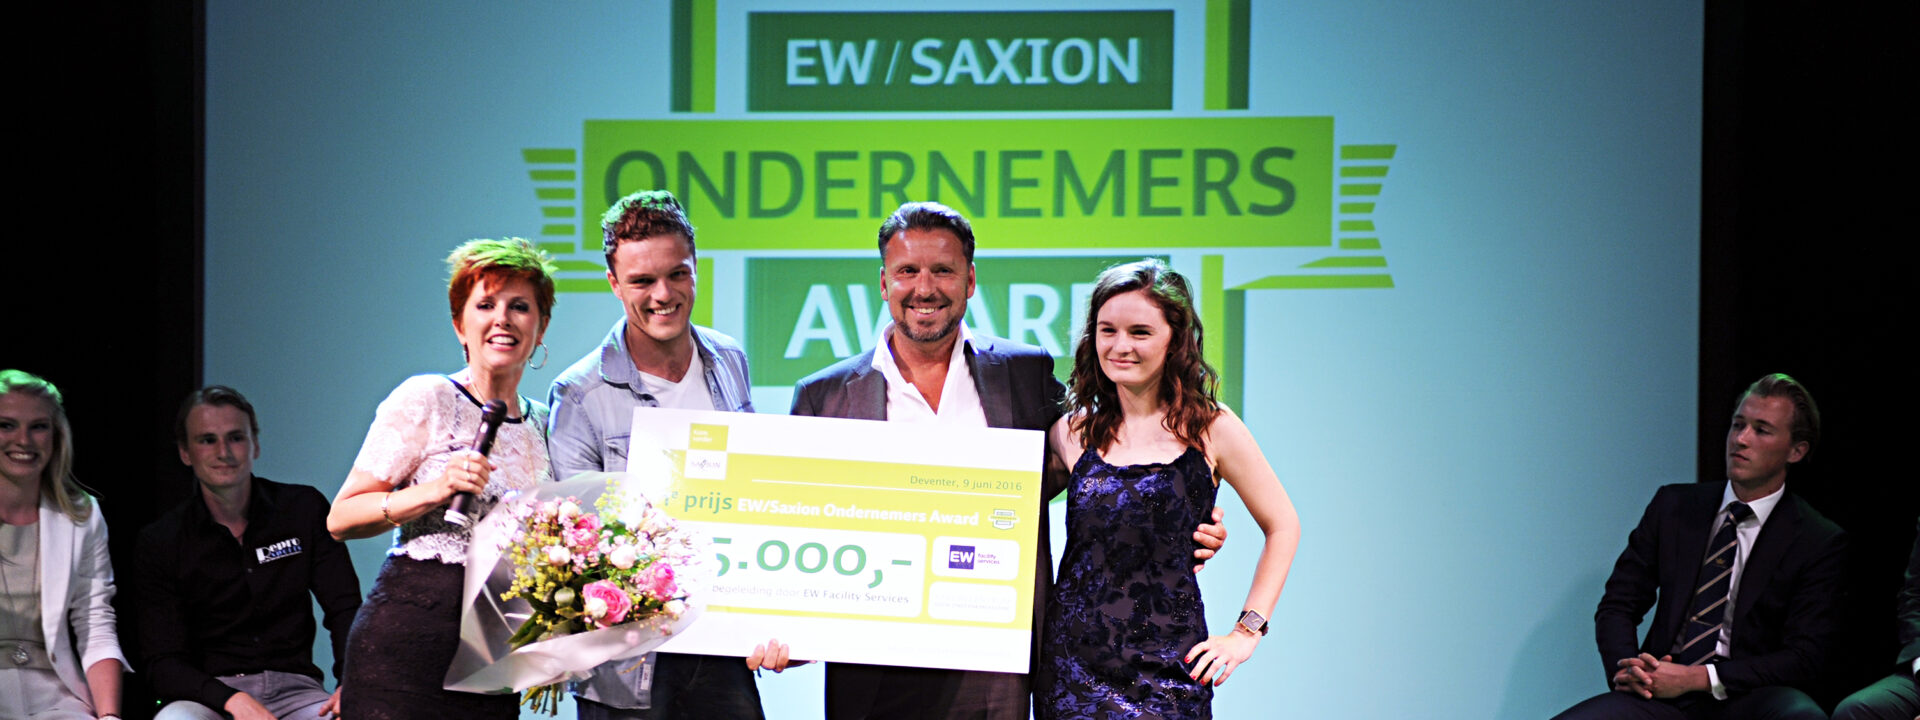 Helft aanmeldingen EW/Saxion Ondernemers Award is al ondernemer